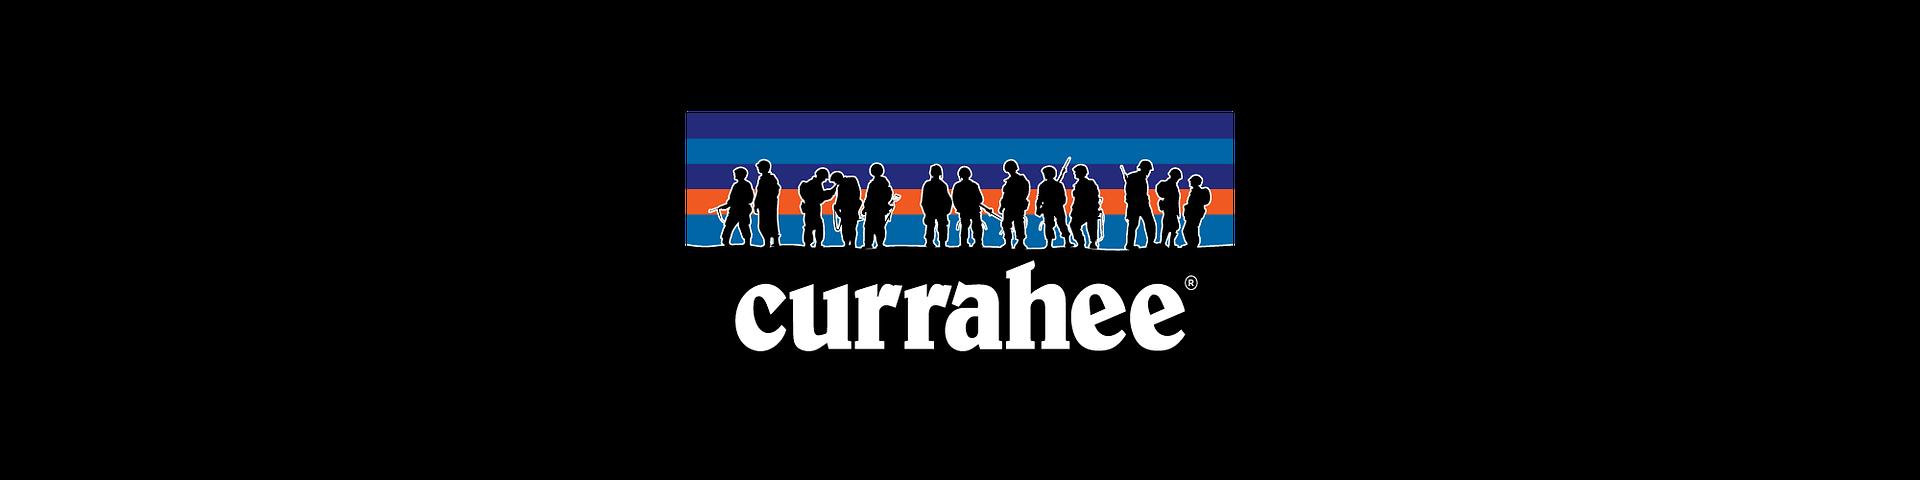 Currahee Fundraiser 2021